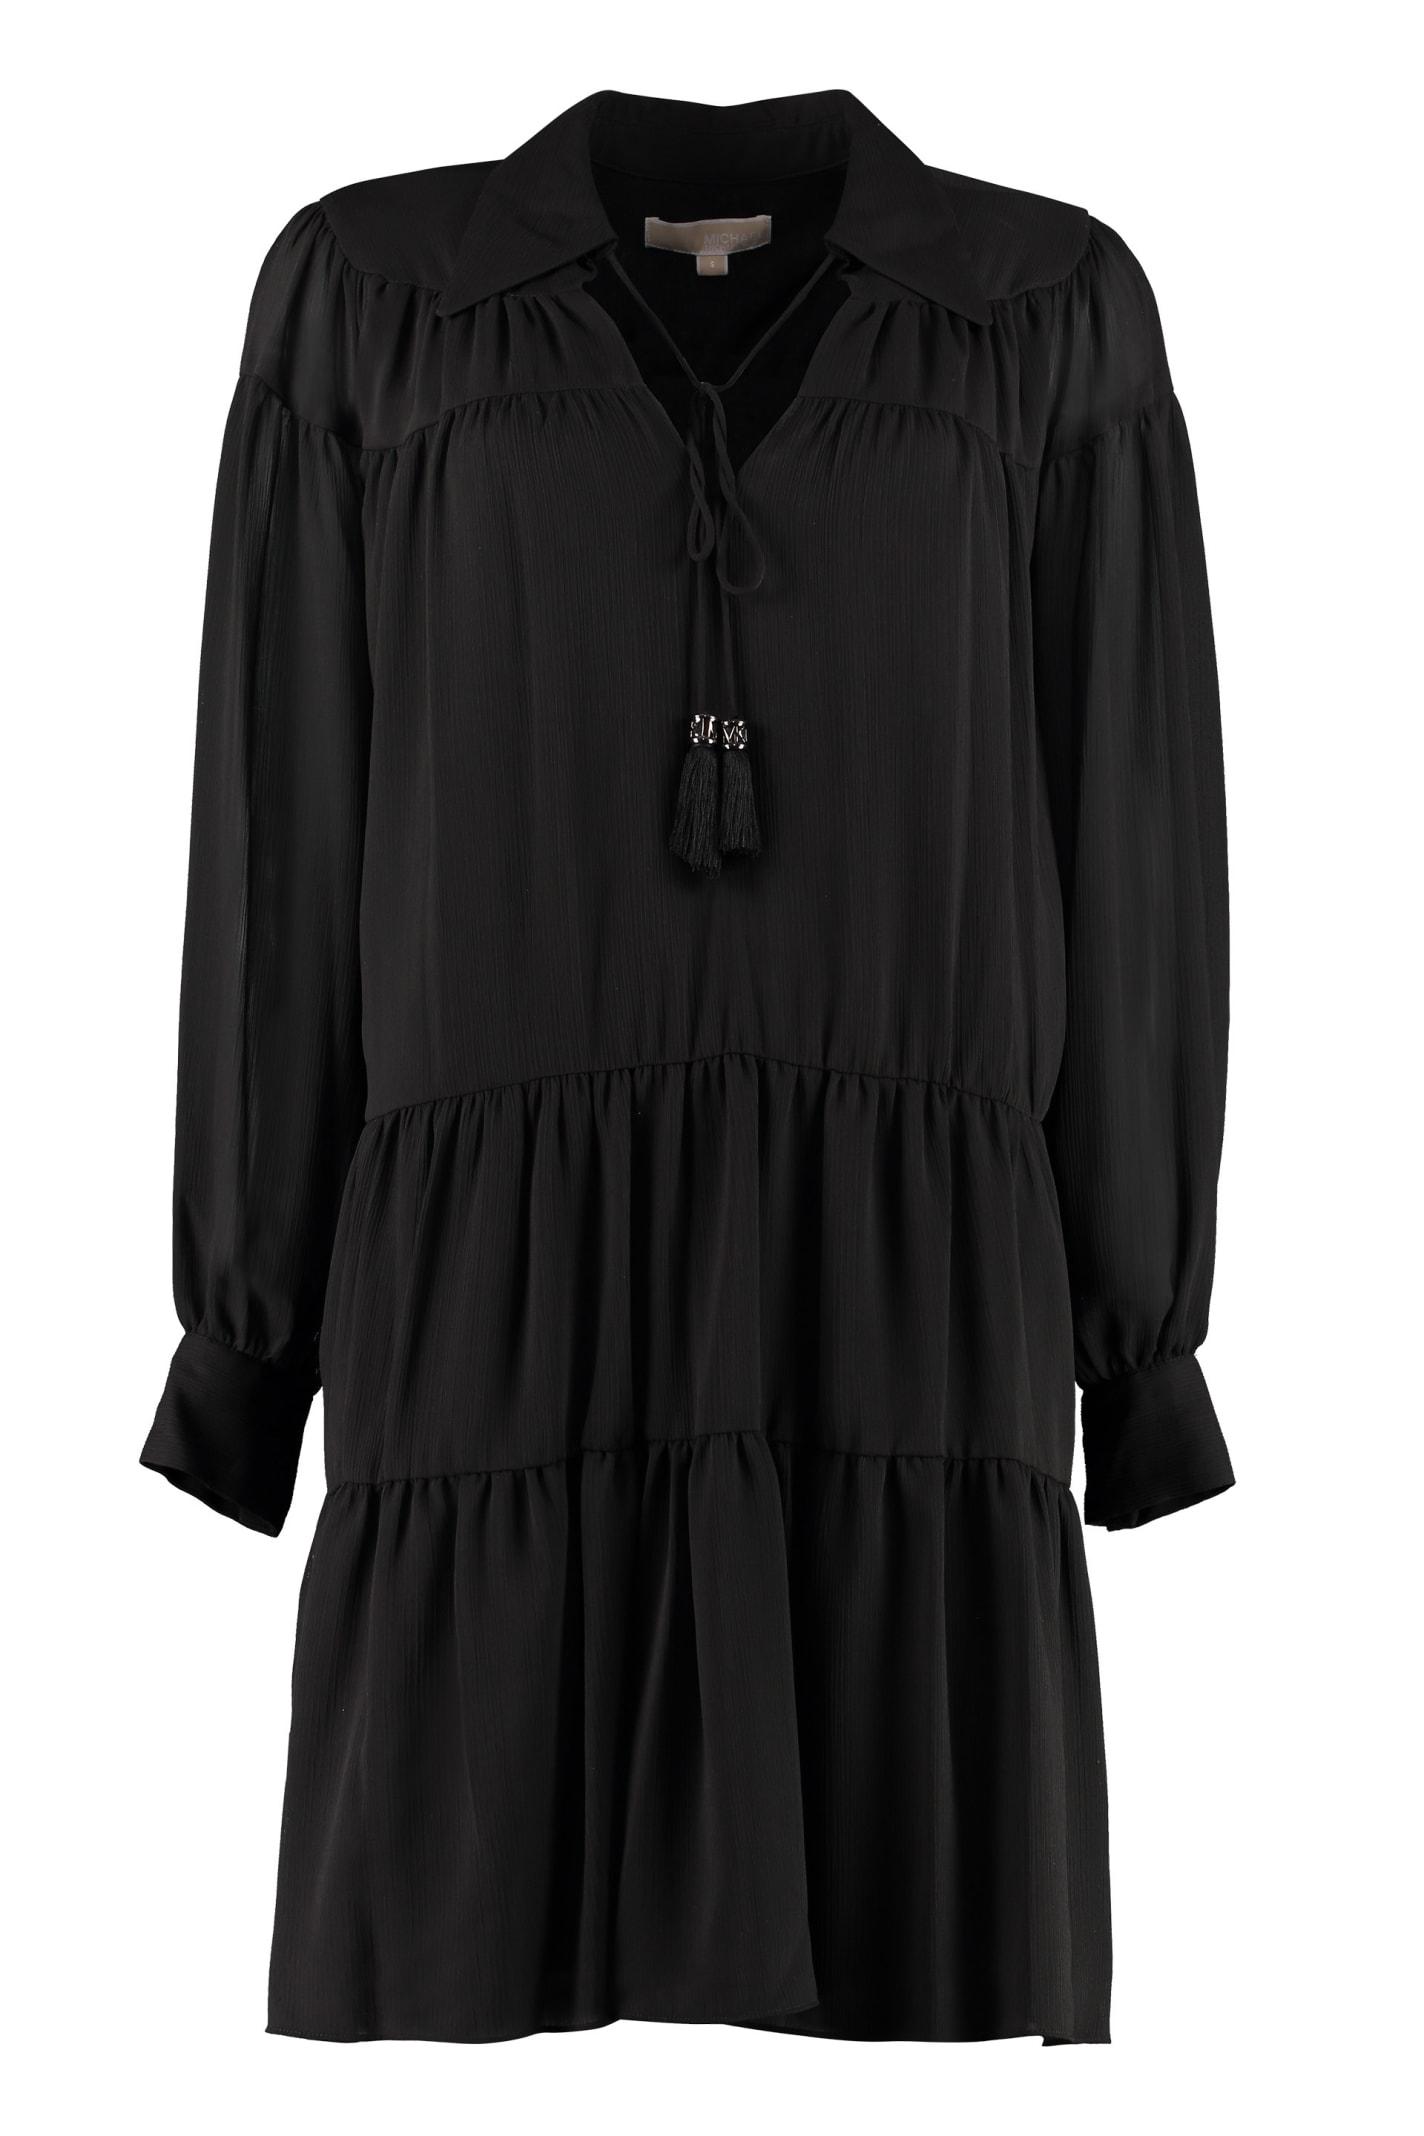 MICHAEL Michael Kors Georgette Dress